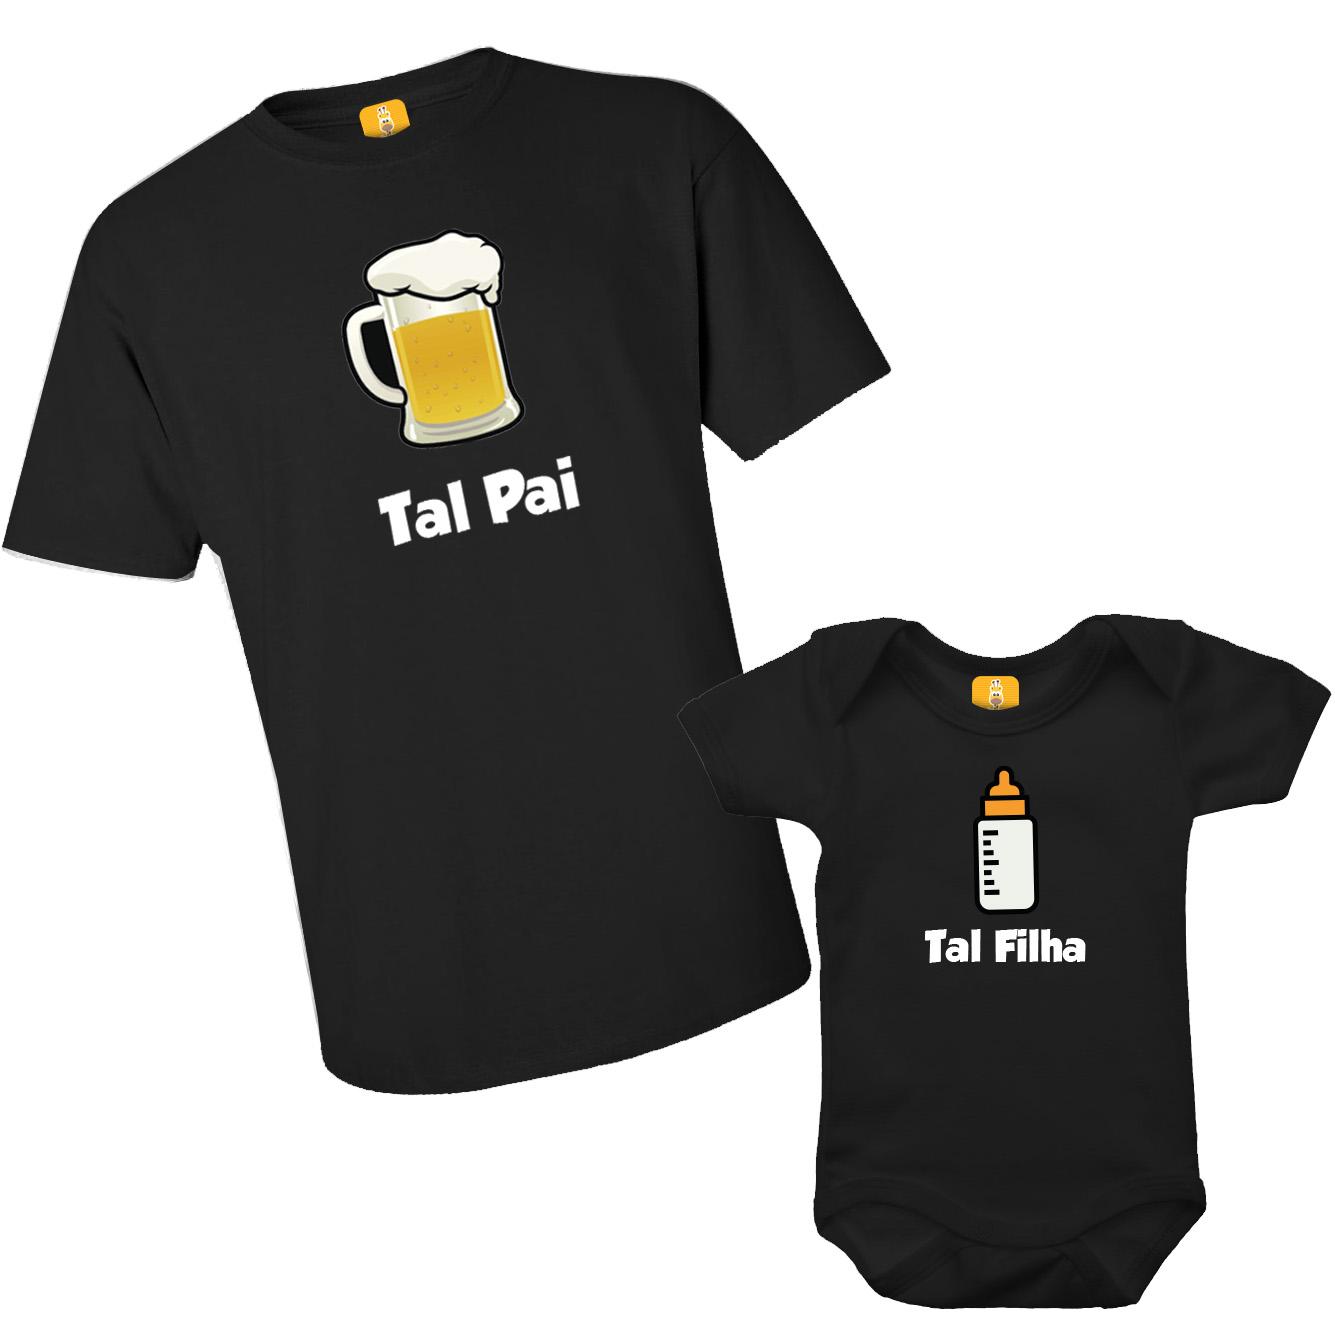 Kit Camiseta e Body Tal Pai Tal Filha - Chopp E Mamadeira